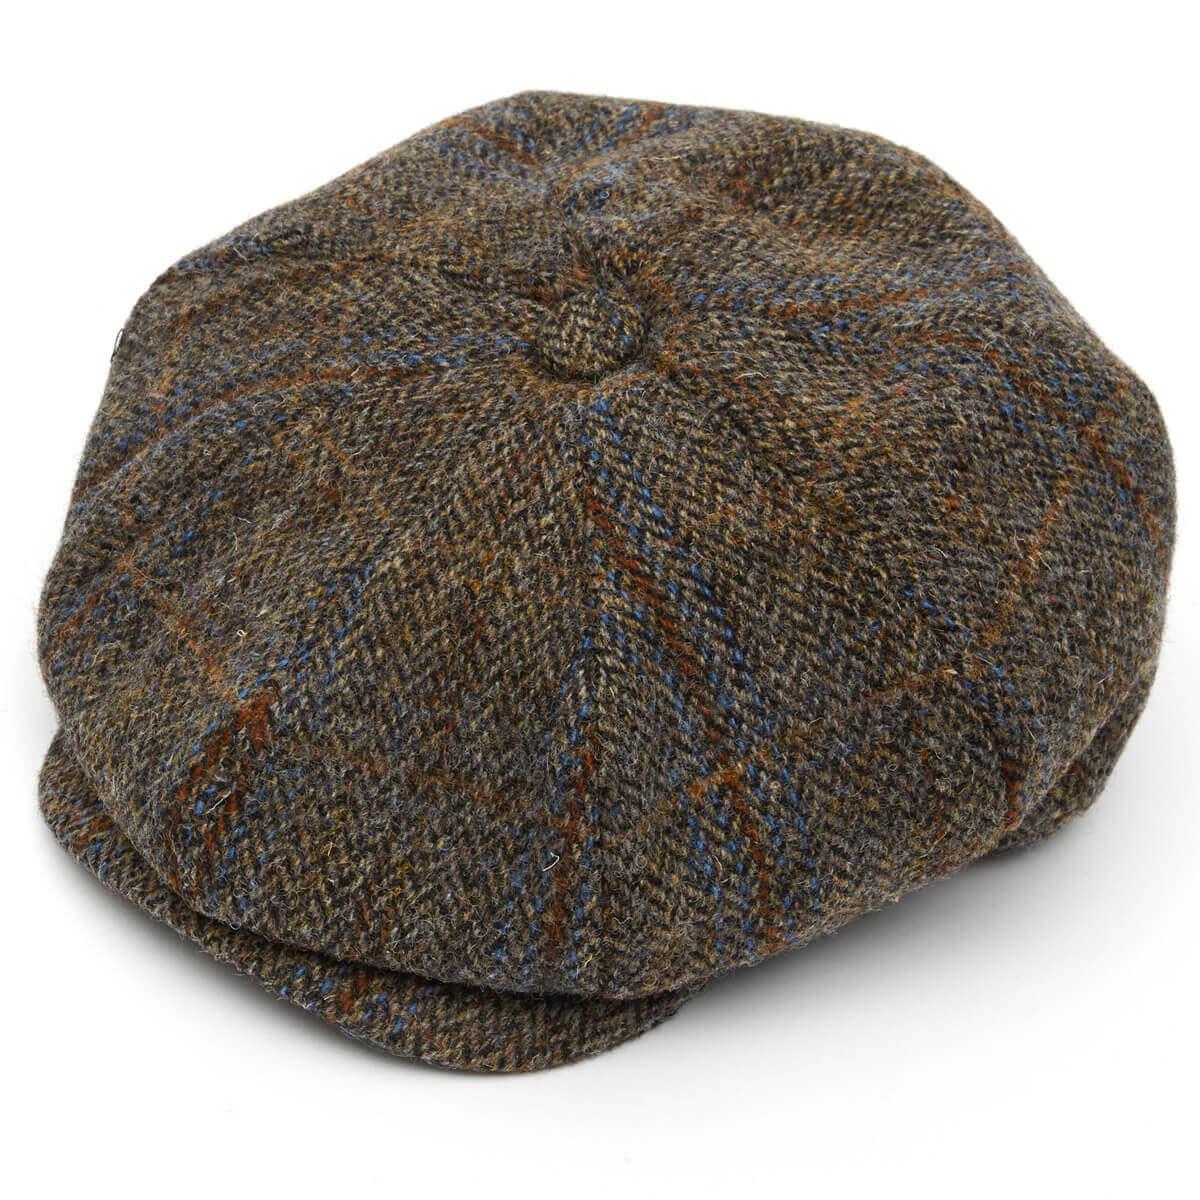 Harris Tweed 8 Piece Baker Boy Flat Cap -L005-XL